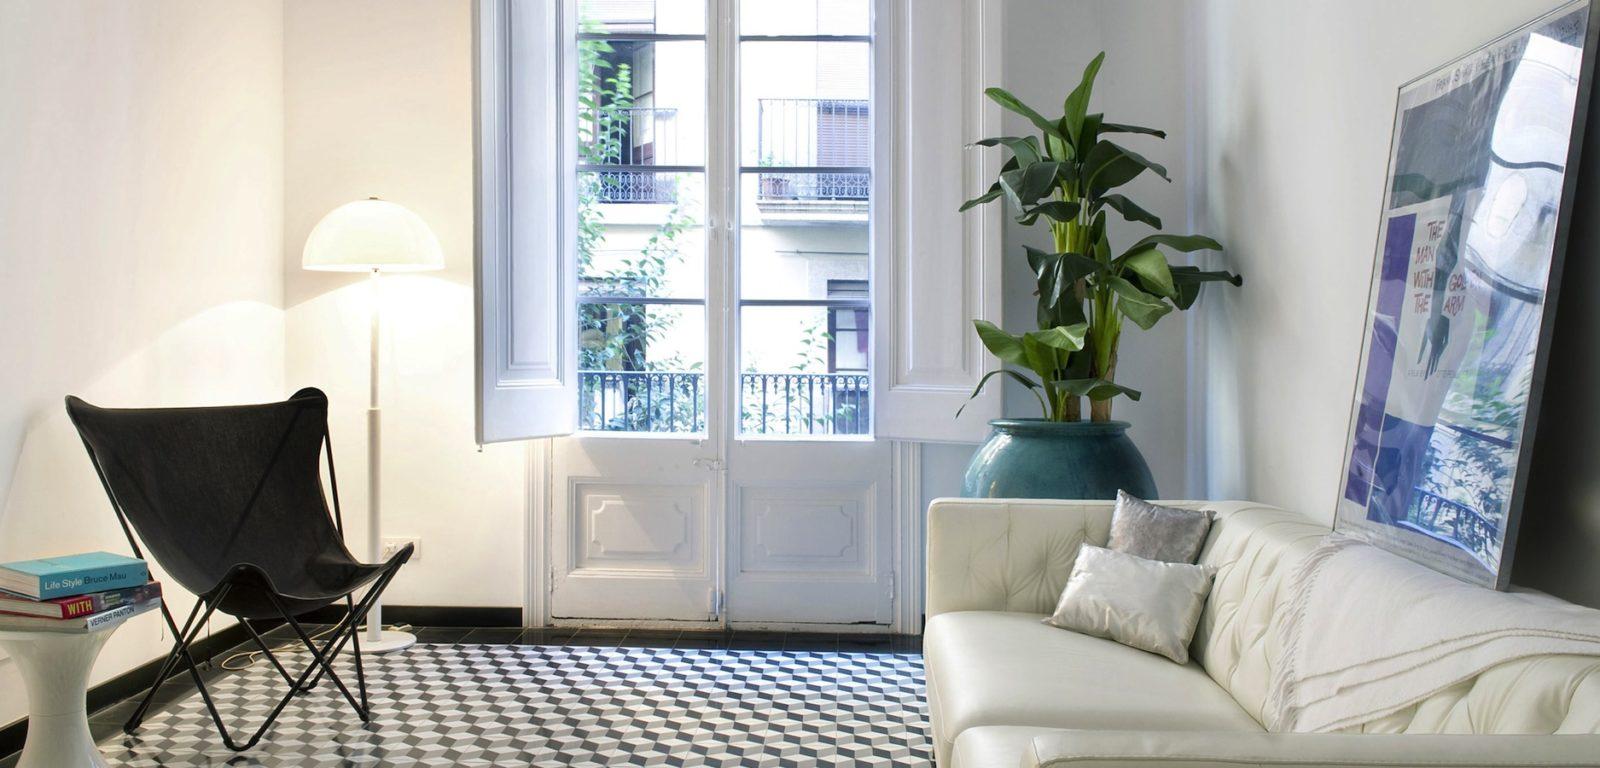 Интерьеры квартир с небольшой площадью